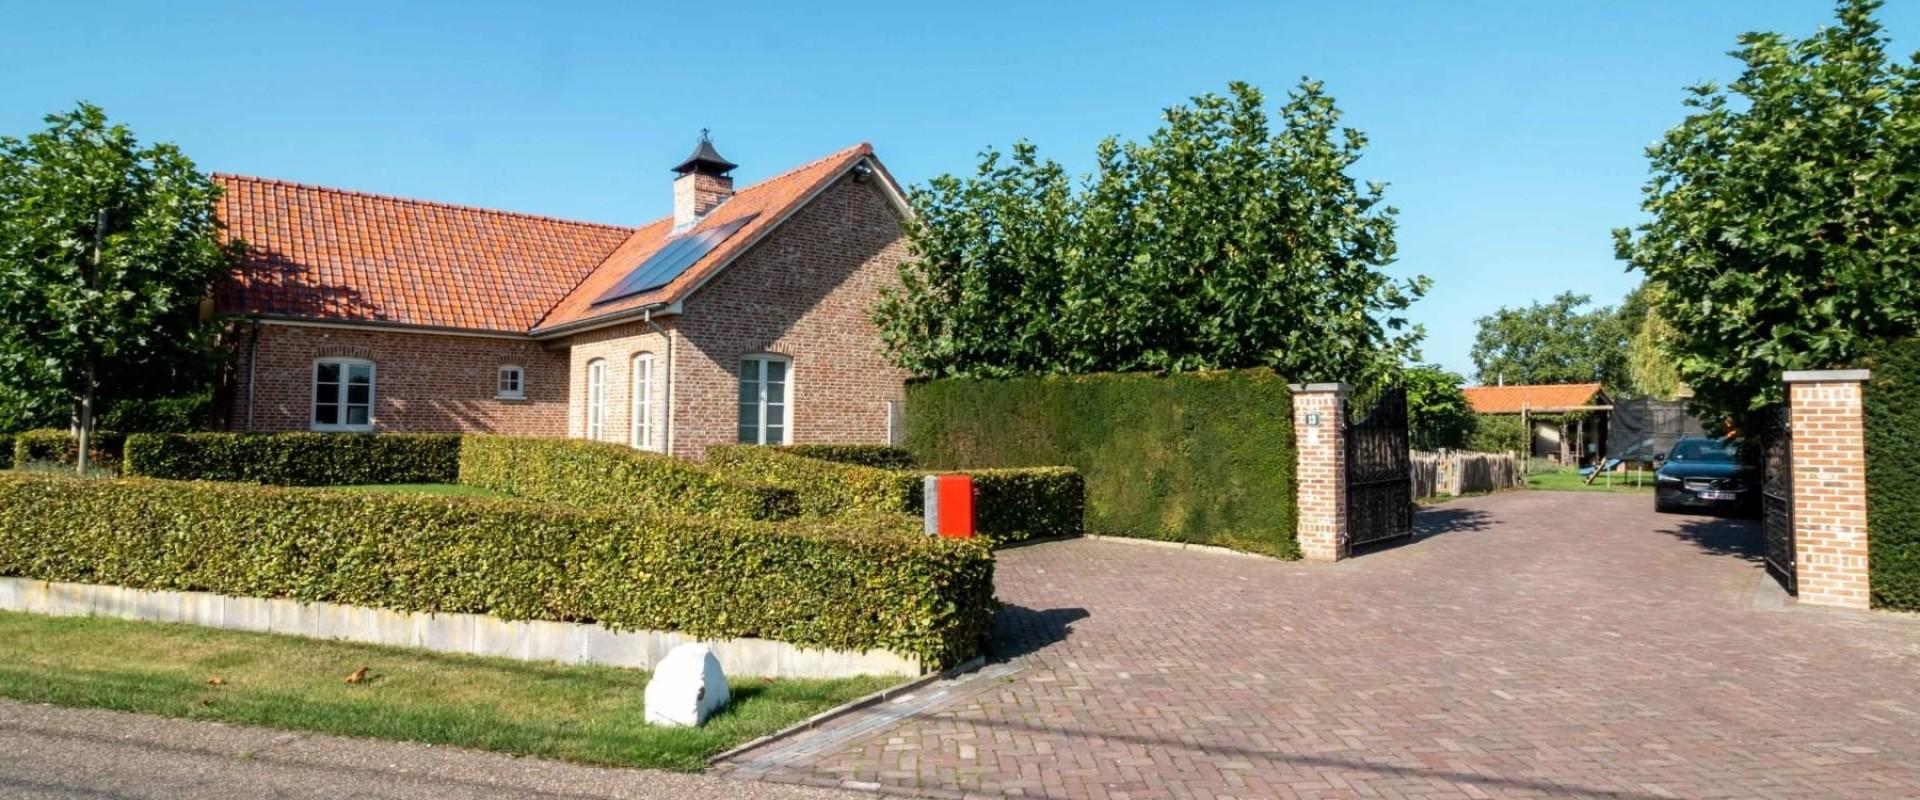 Te koop Parklaan 36 6039 BE Stramproy (België)